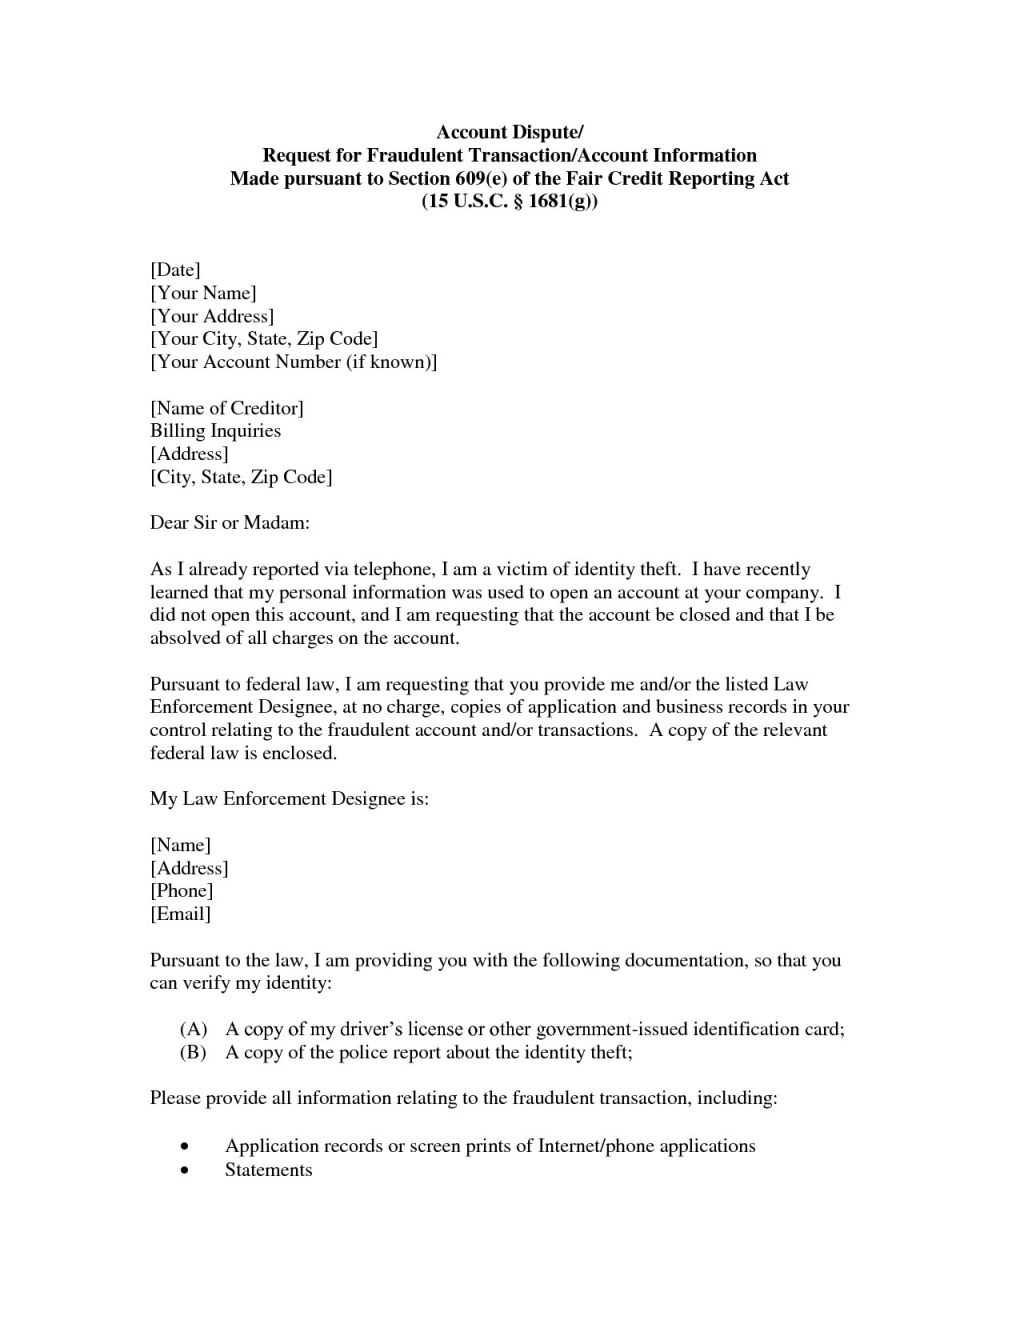 Free Credit Report Dispute Letter Template Hard Inquiries With Regard To Credit Dispute Letter Template